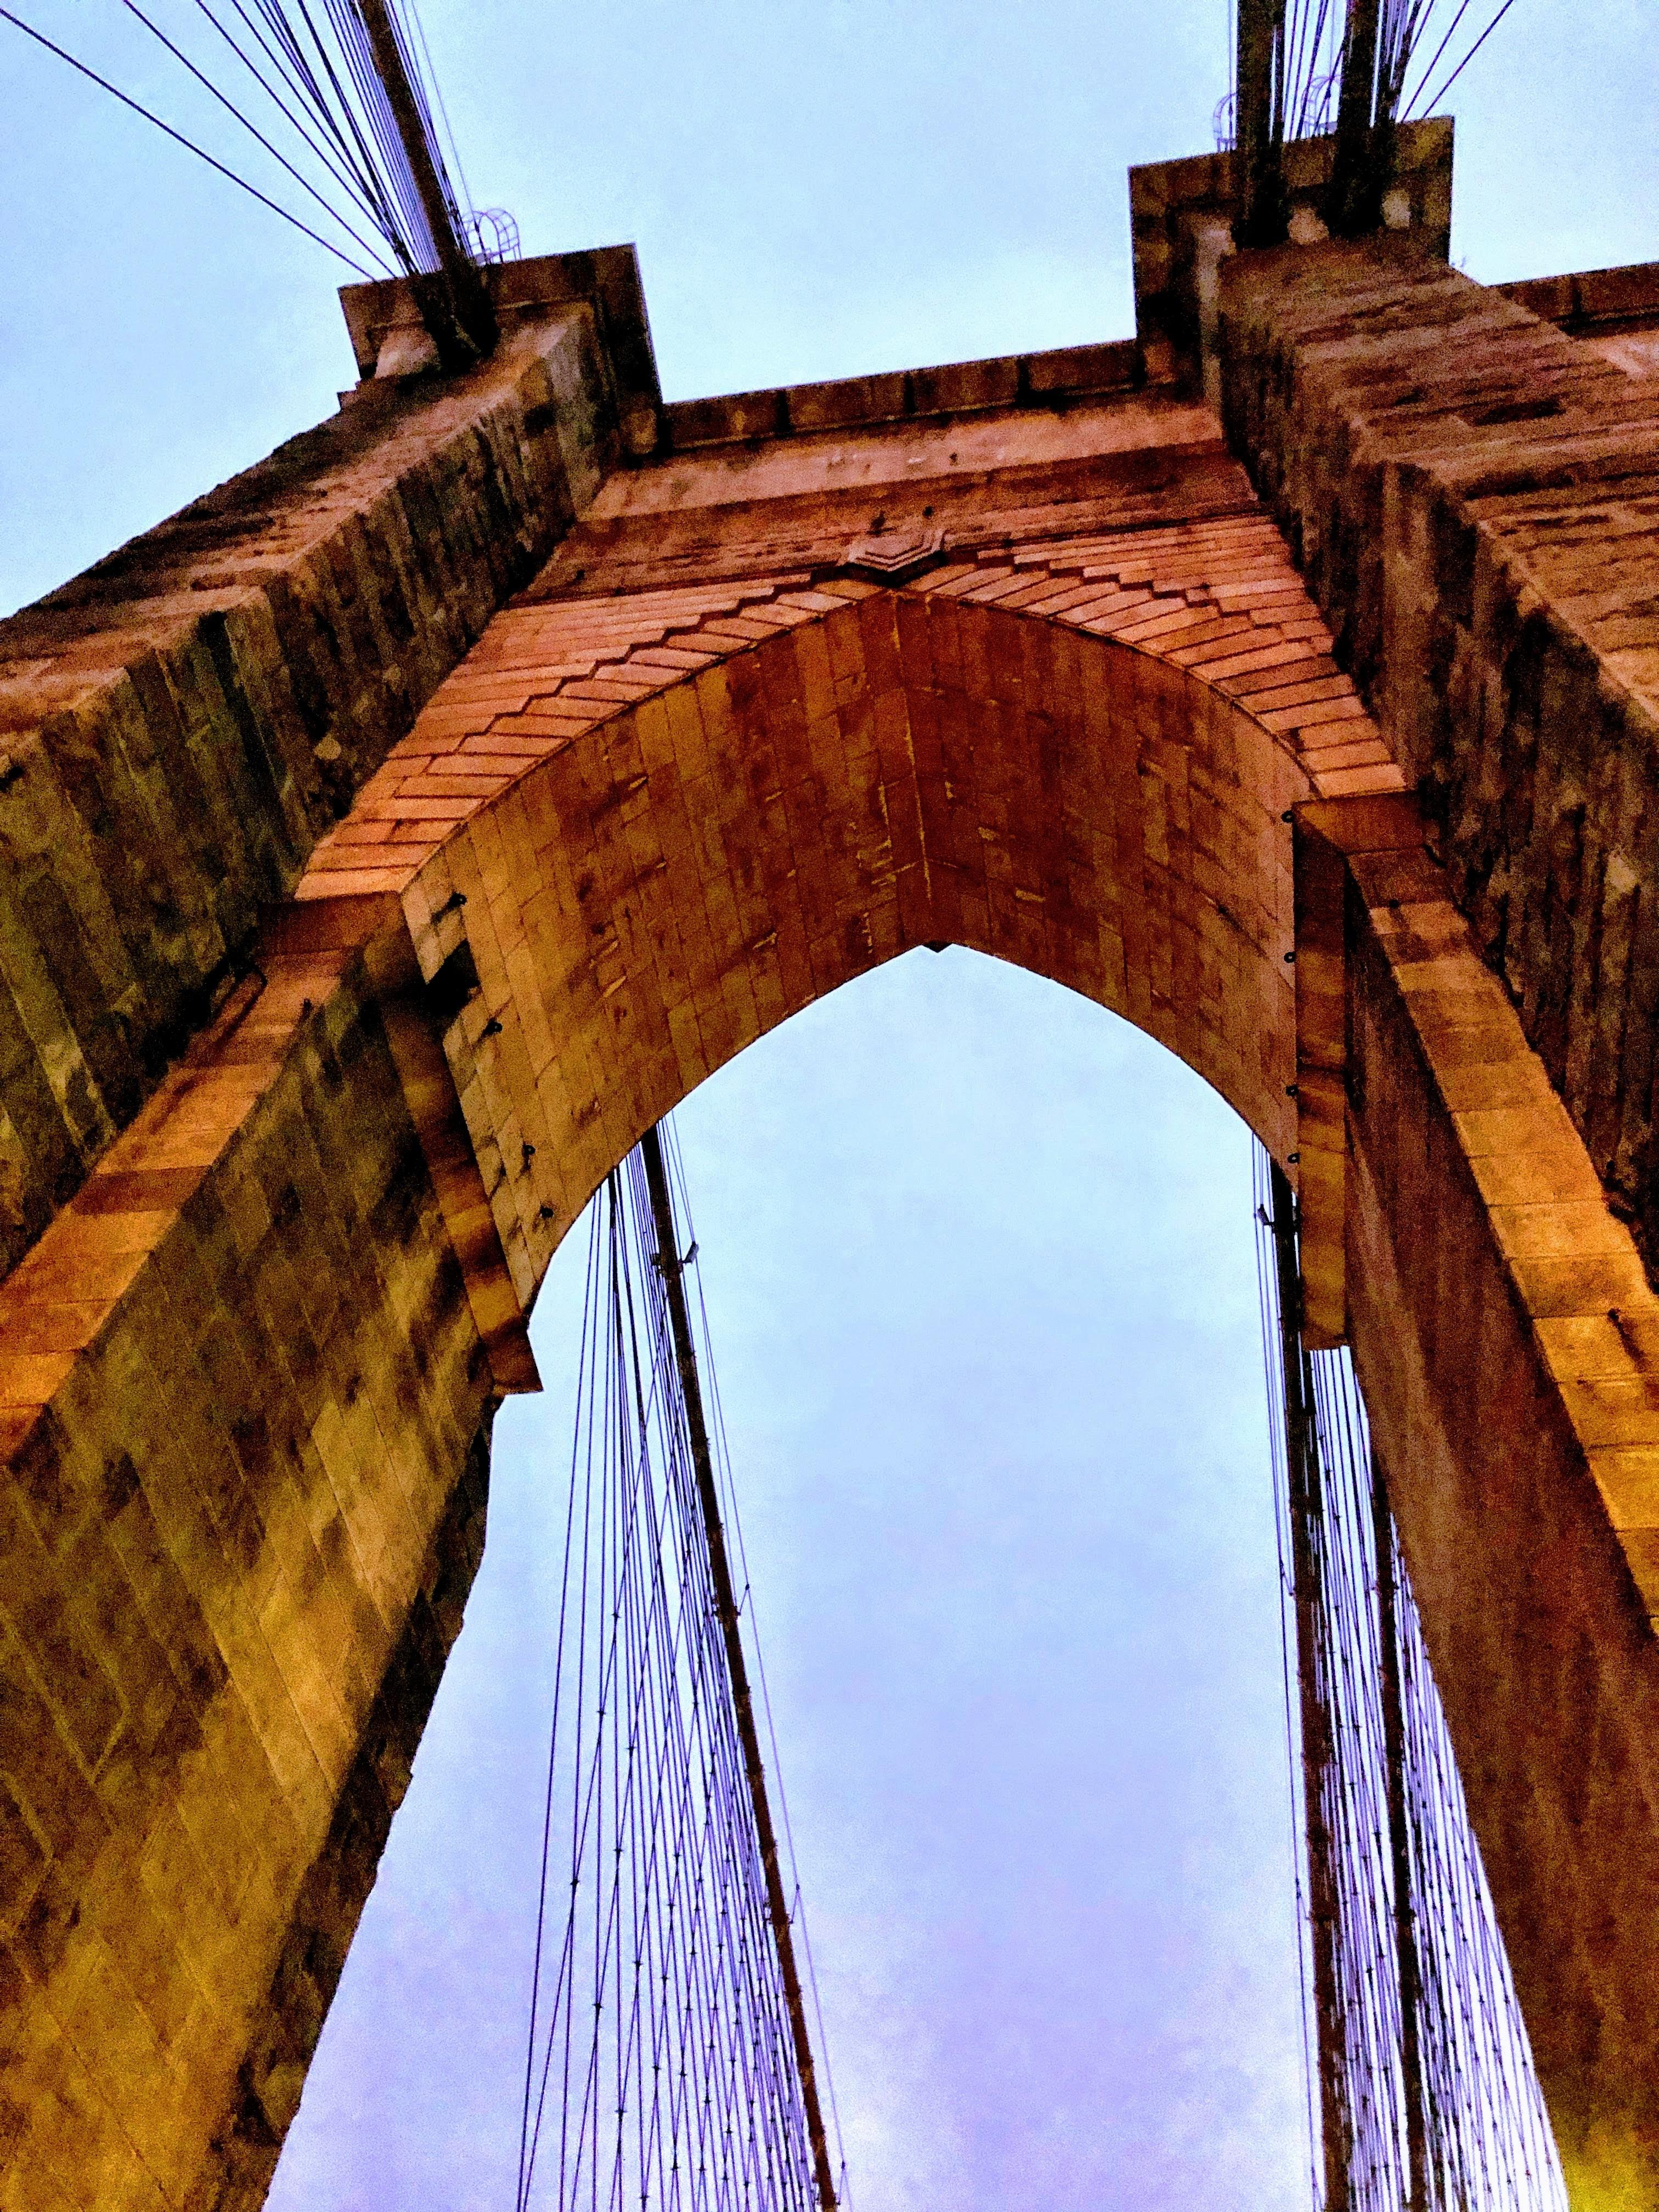 Brooklyn Bridge arch looking up